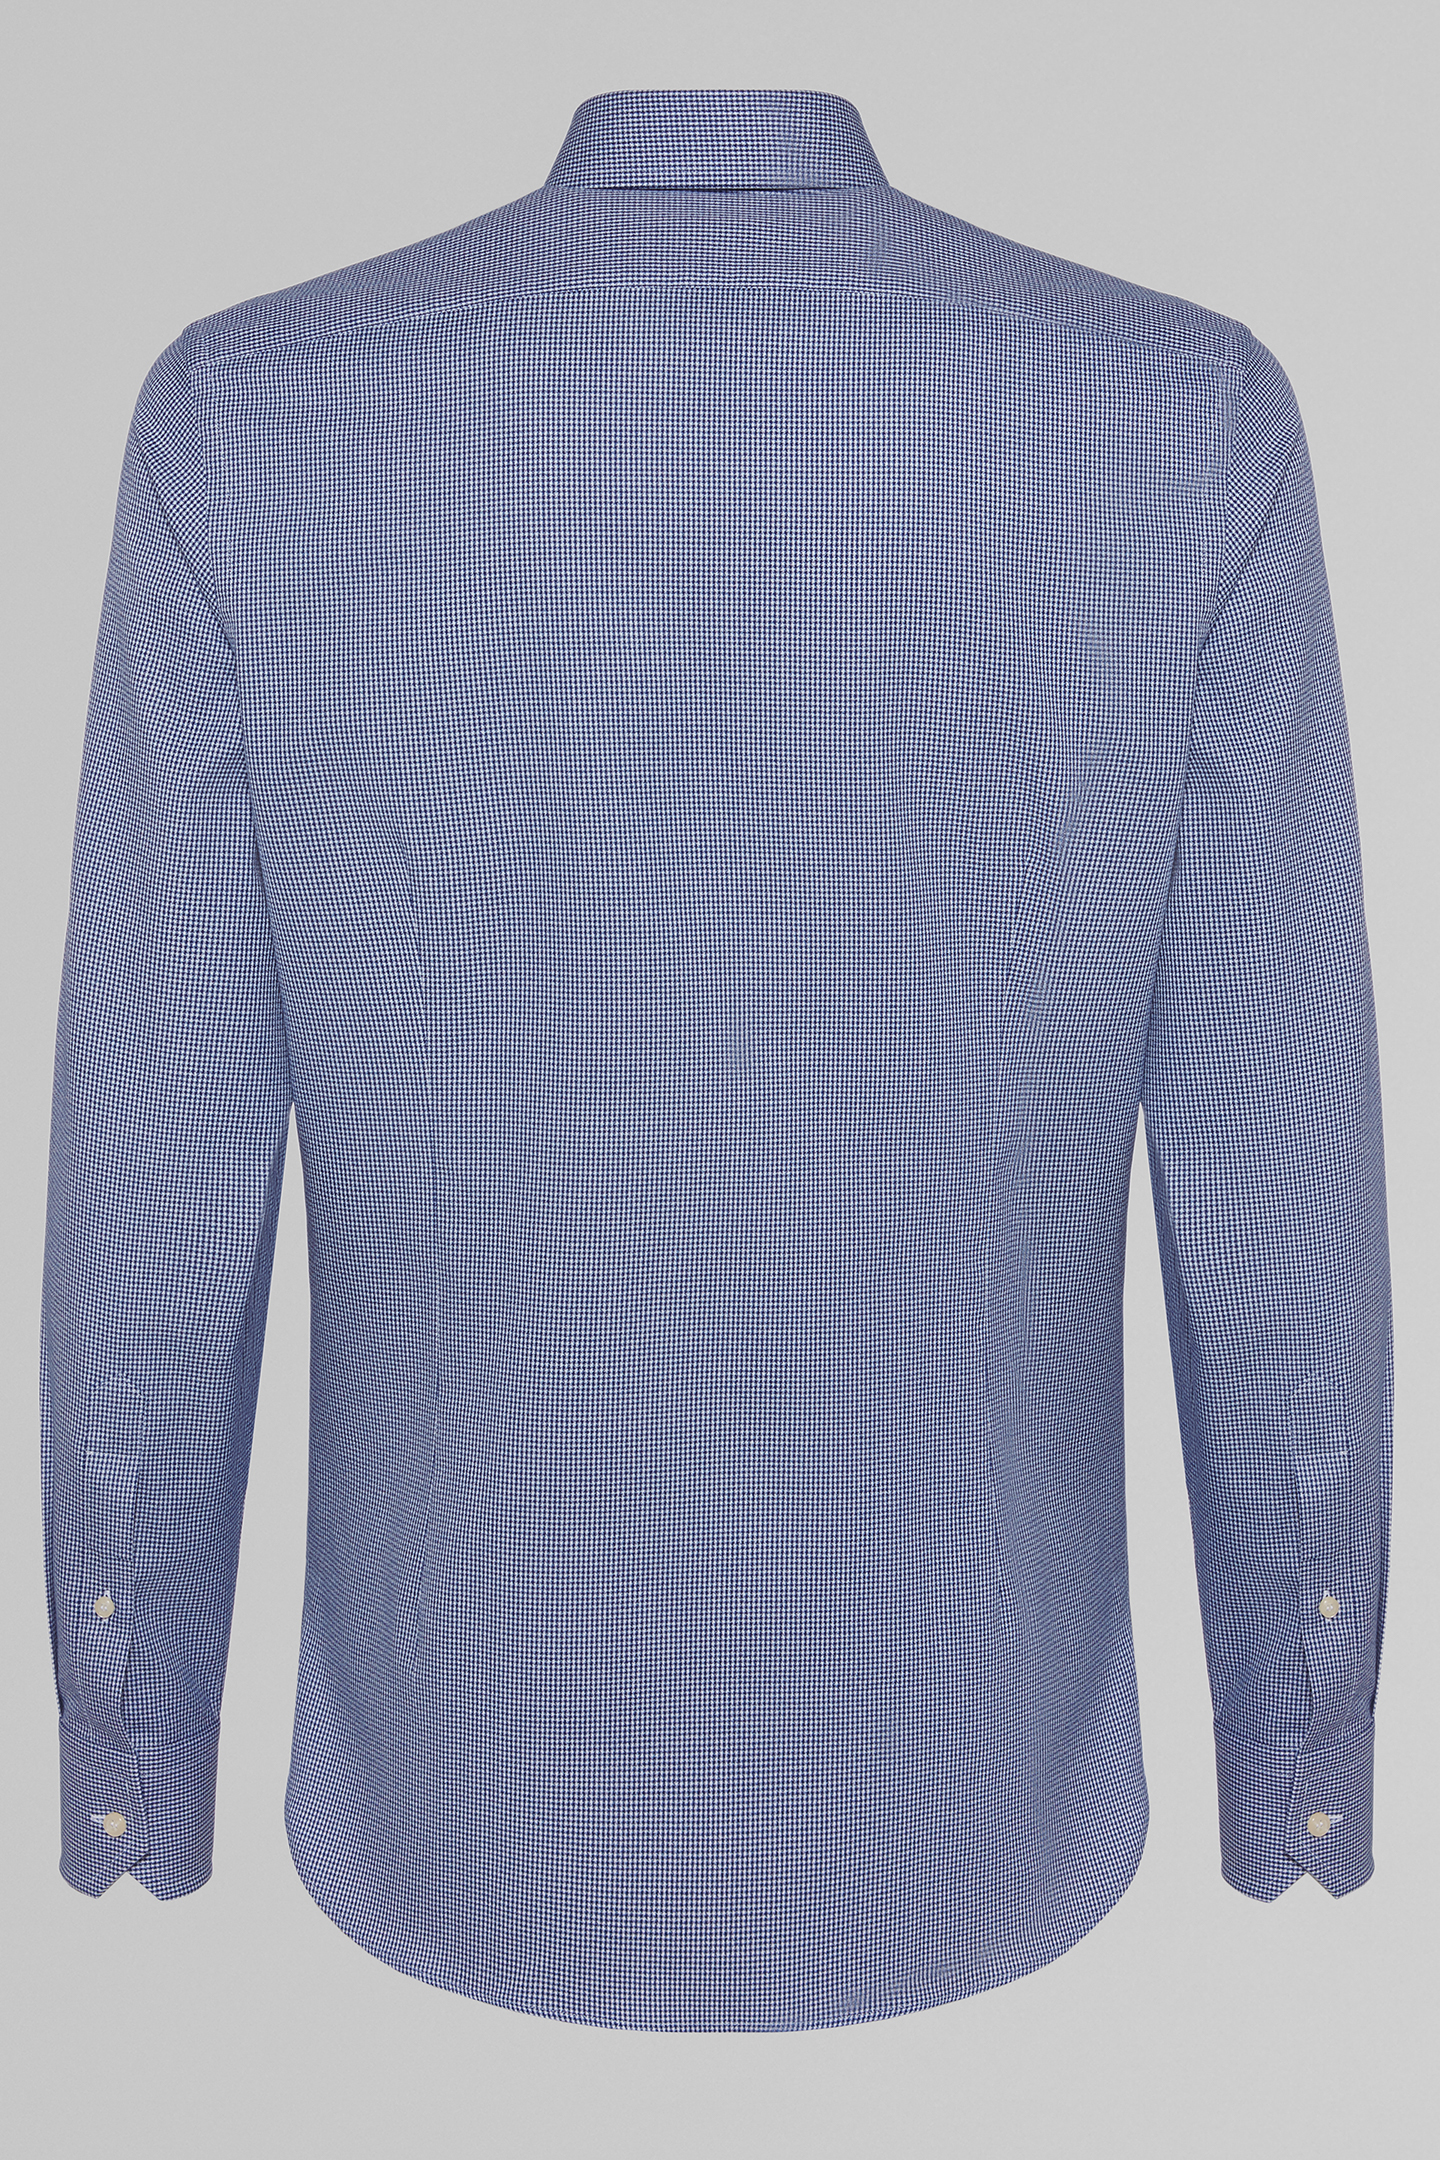 Camisa Boggi Slim Fit Azul Marino Con Cuello Windsor